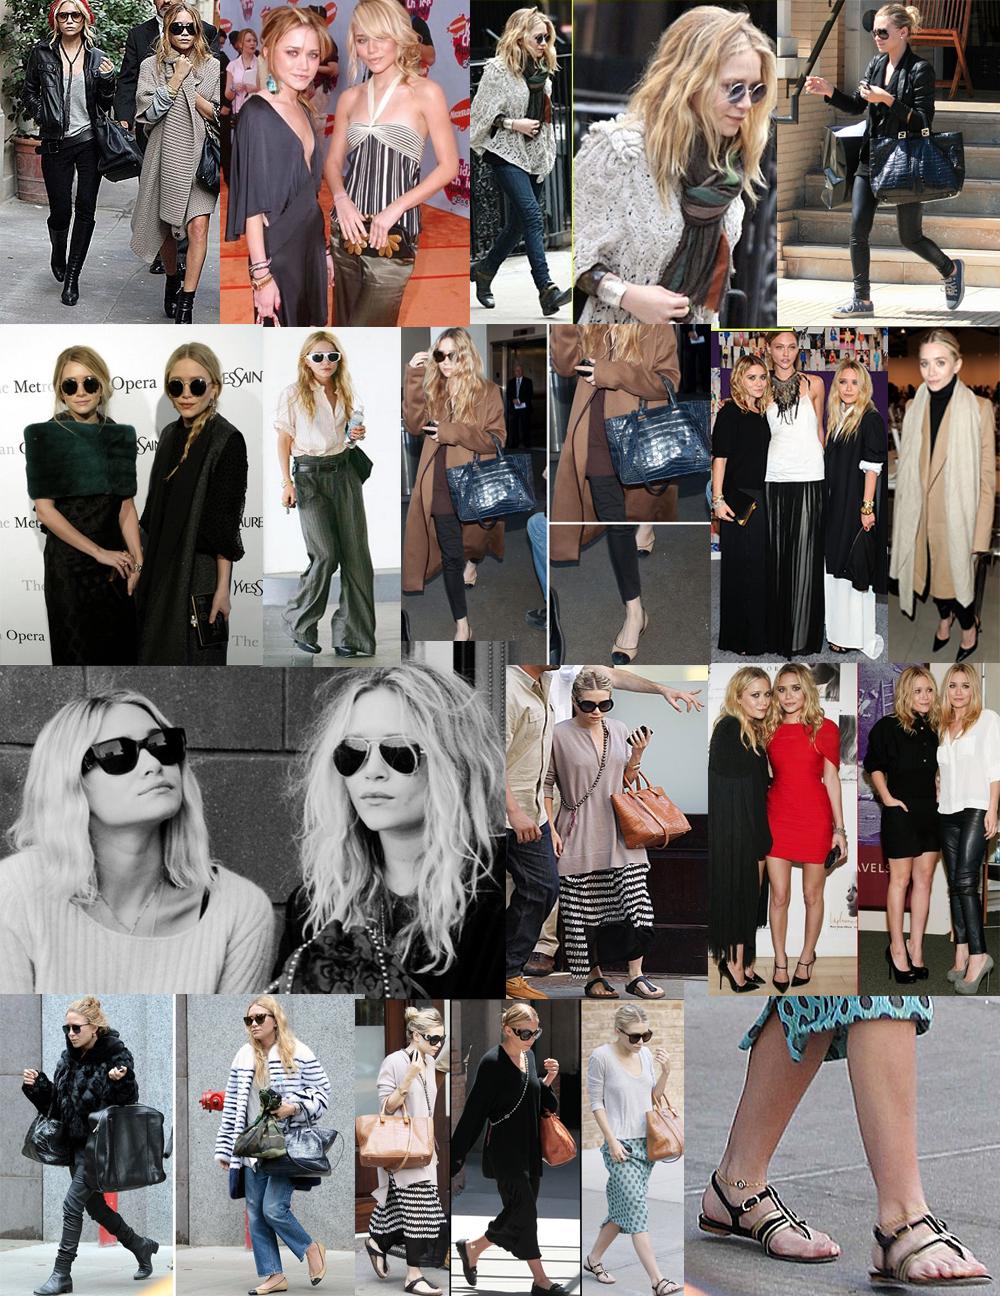 gemelle_olsen_stile_classe_moda_consigli_stile_piccole_altezze